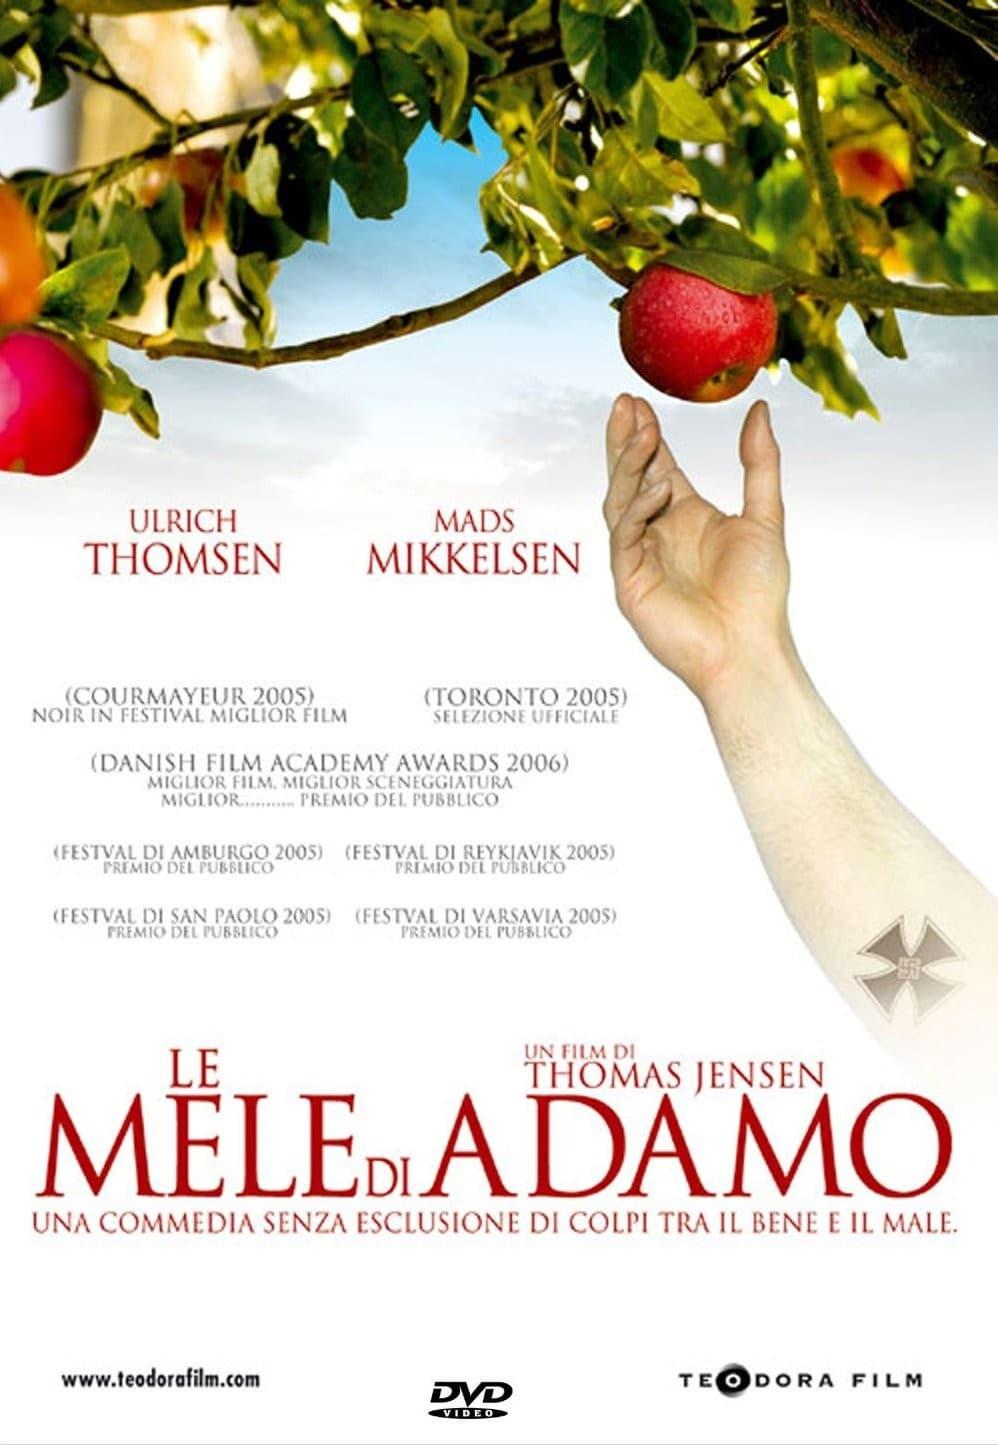 Che film guardo stasera? / What film am i watching tonight? Le mele di Adamo